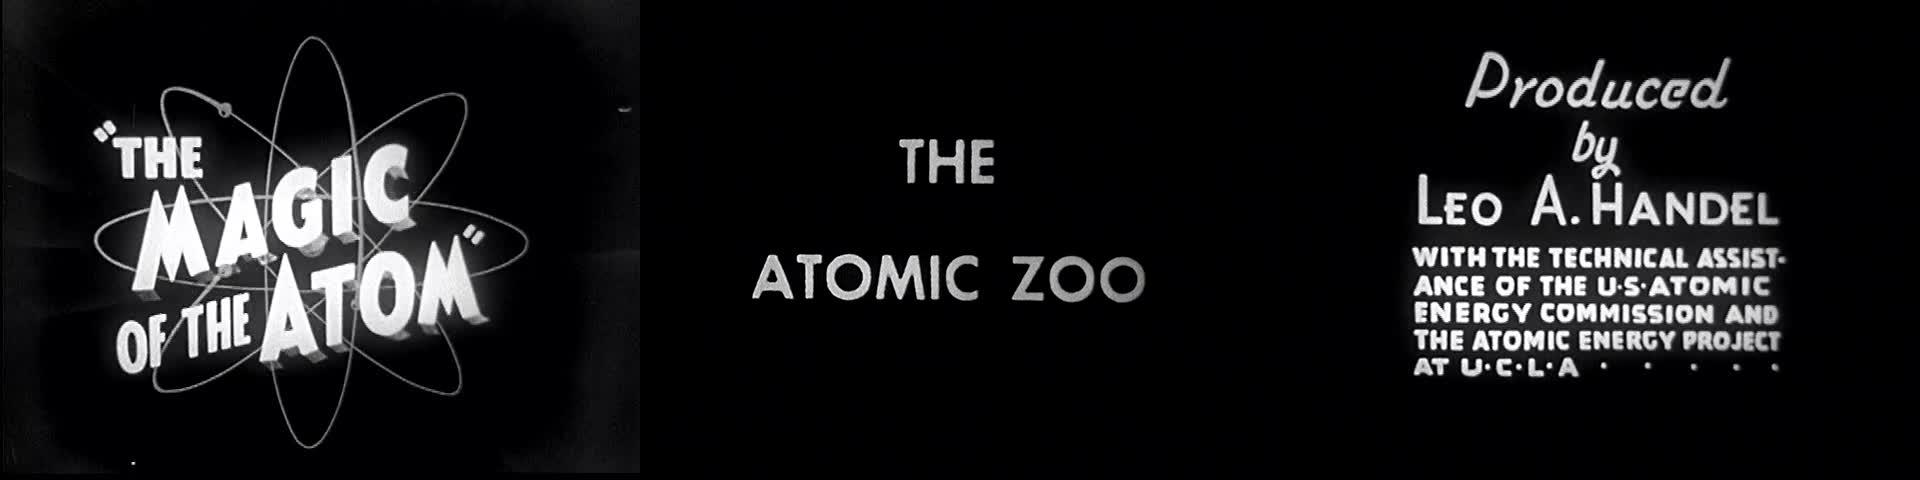 MagicOfTheAtomAtomicZoo